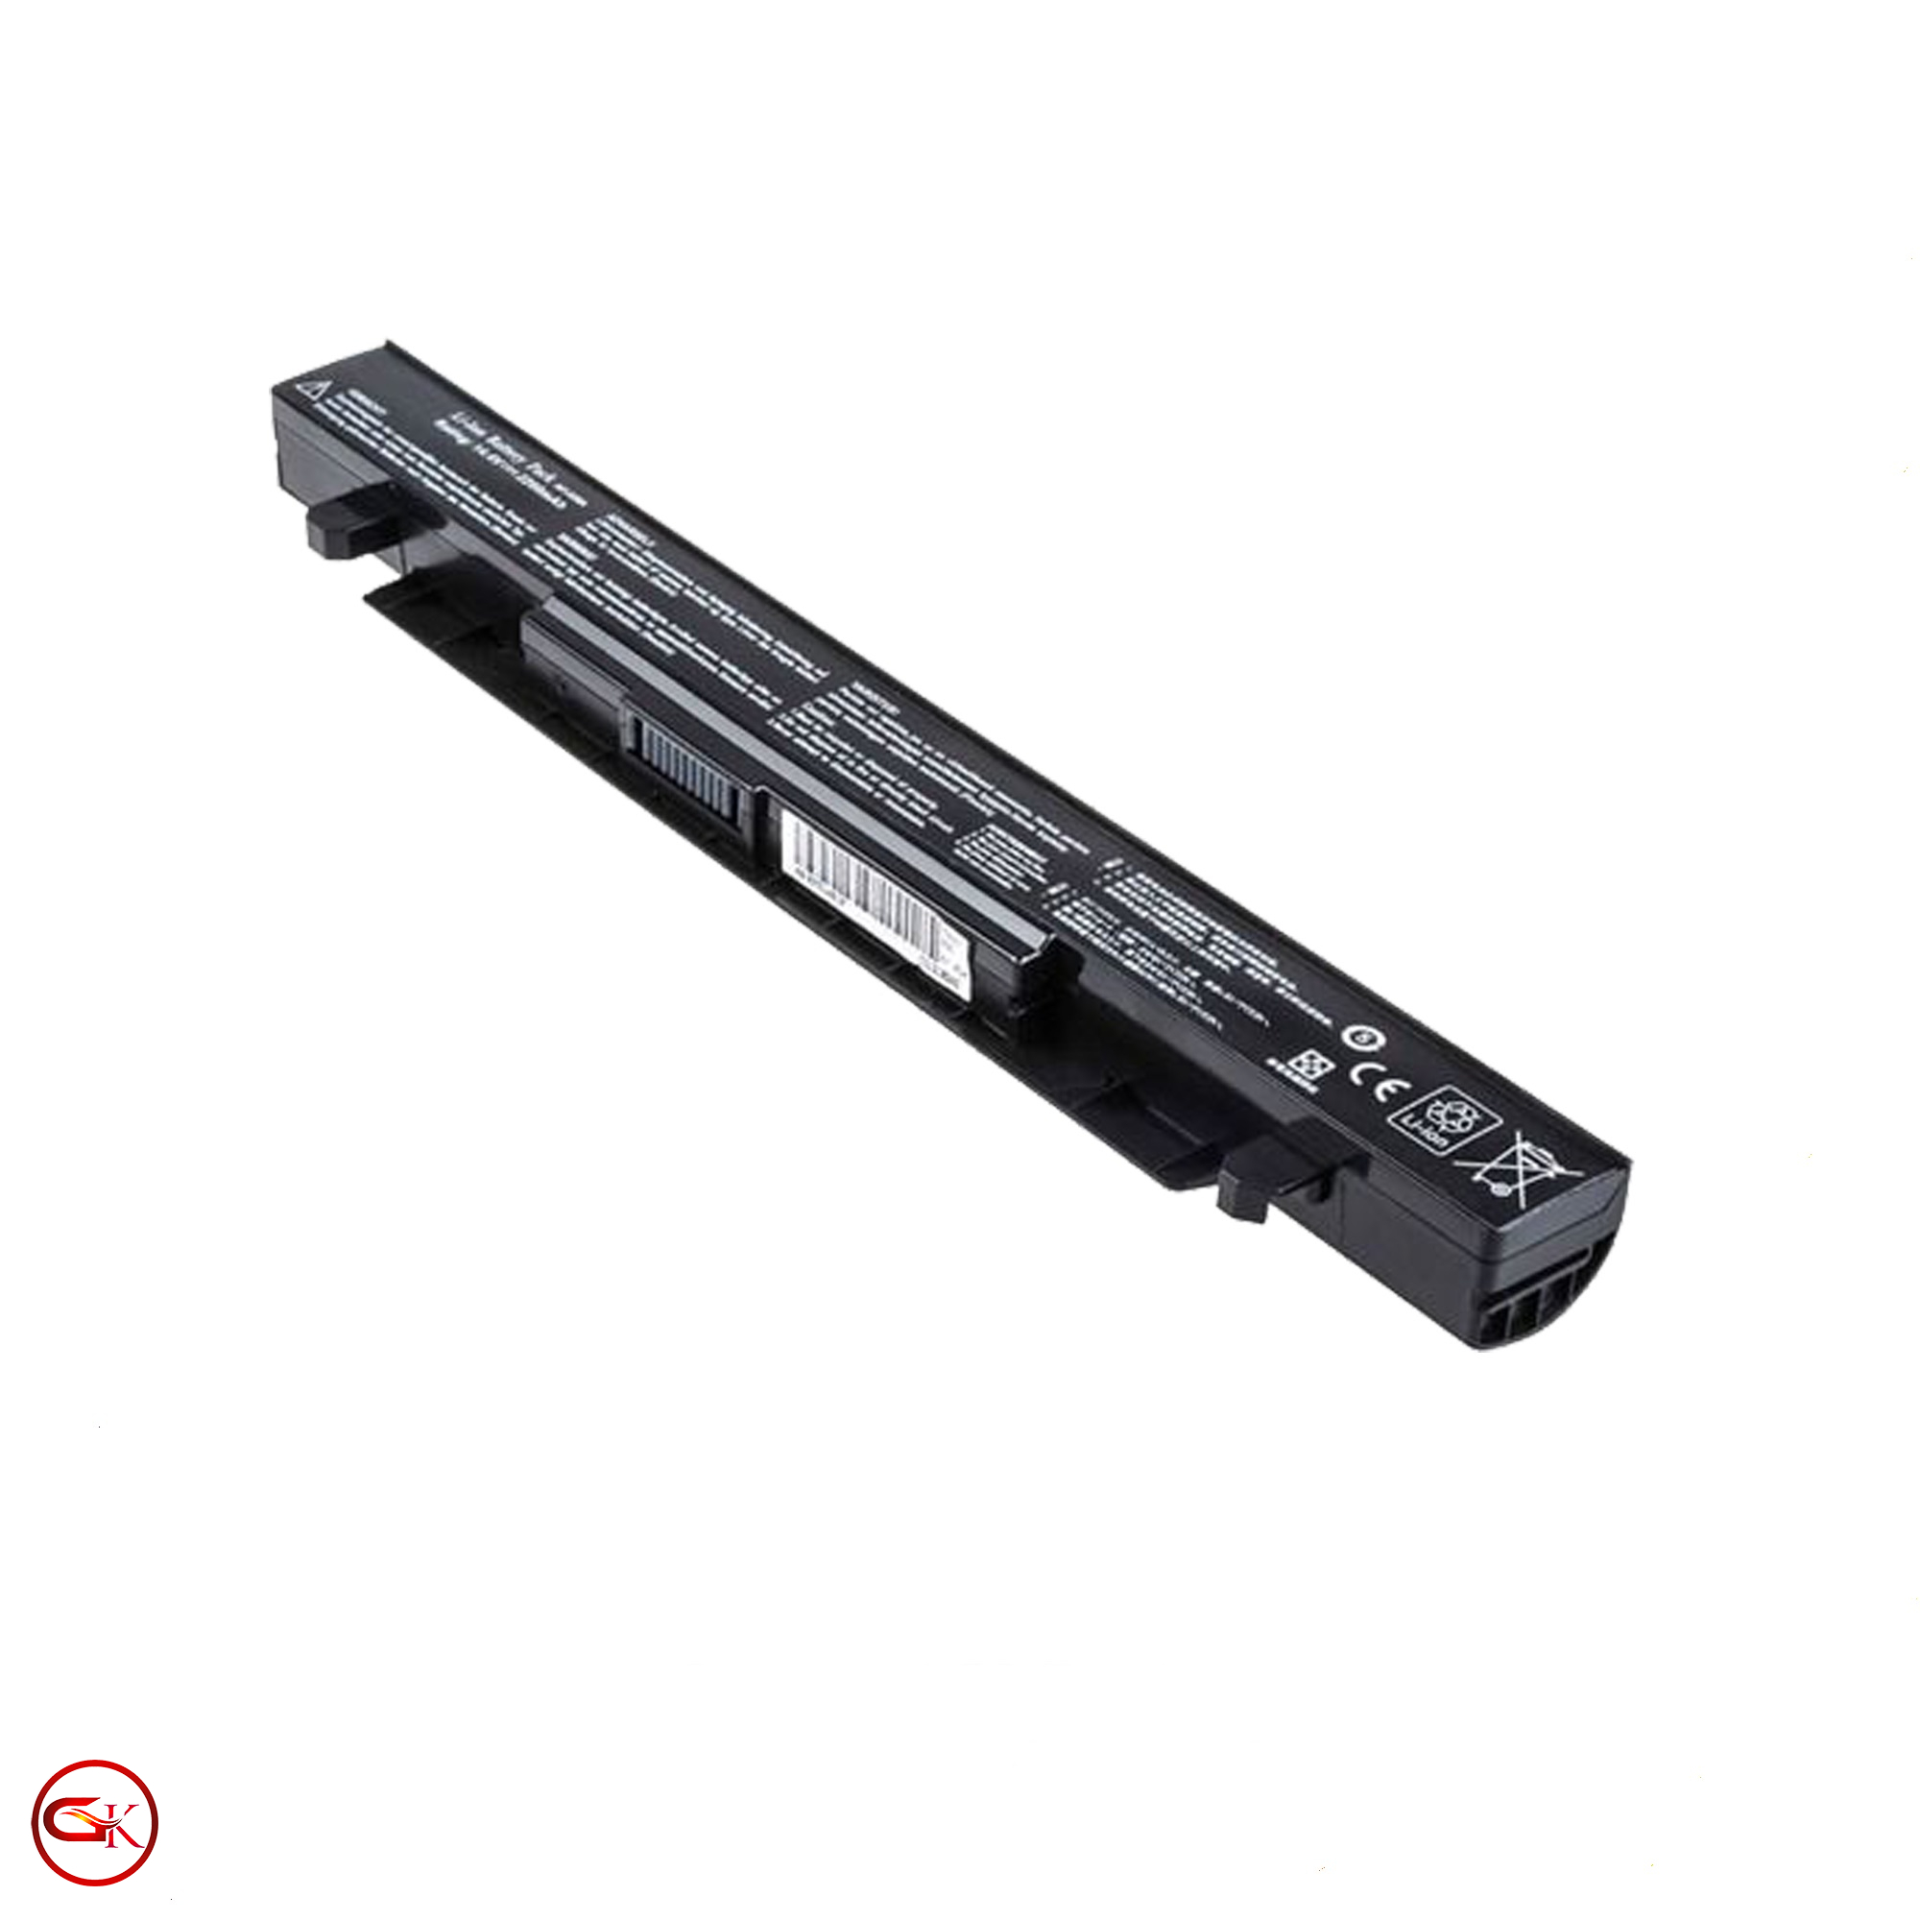 Asus Laptop battery P450